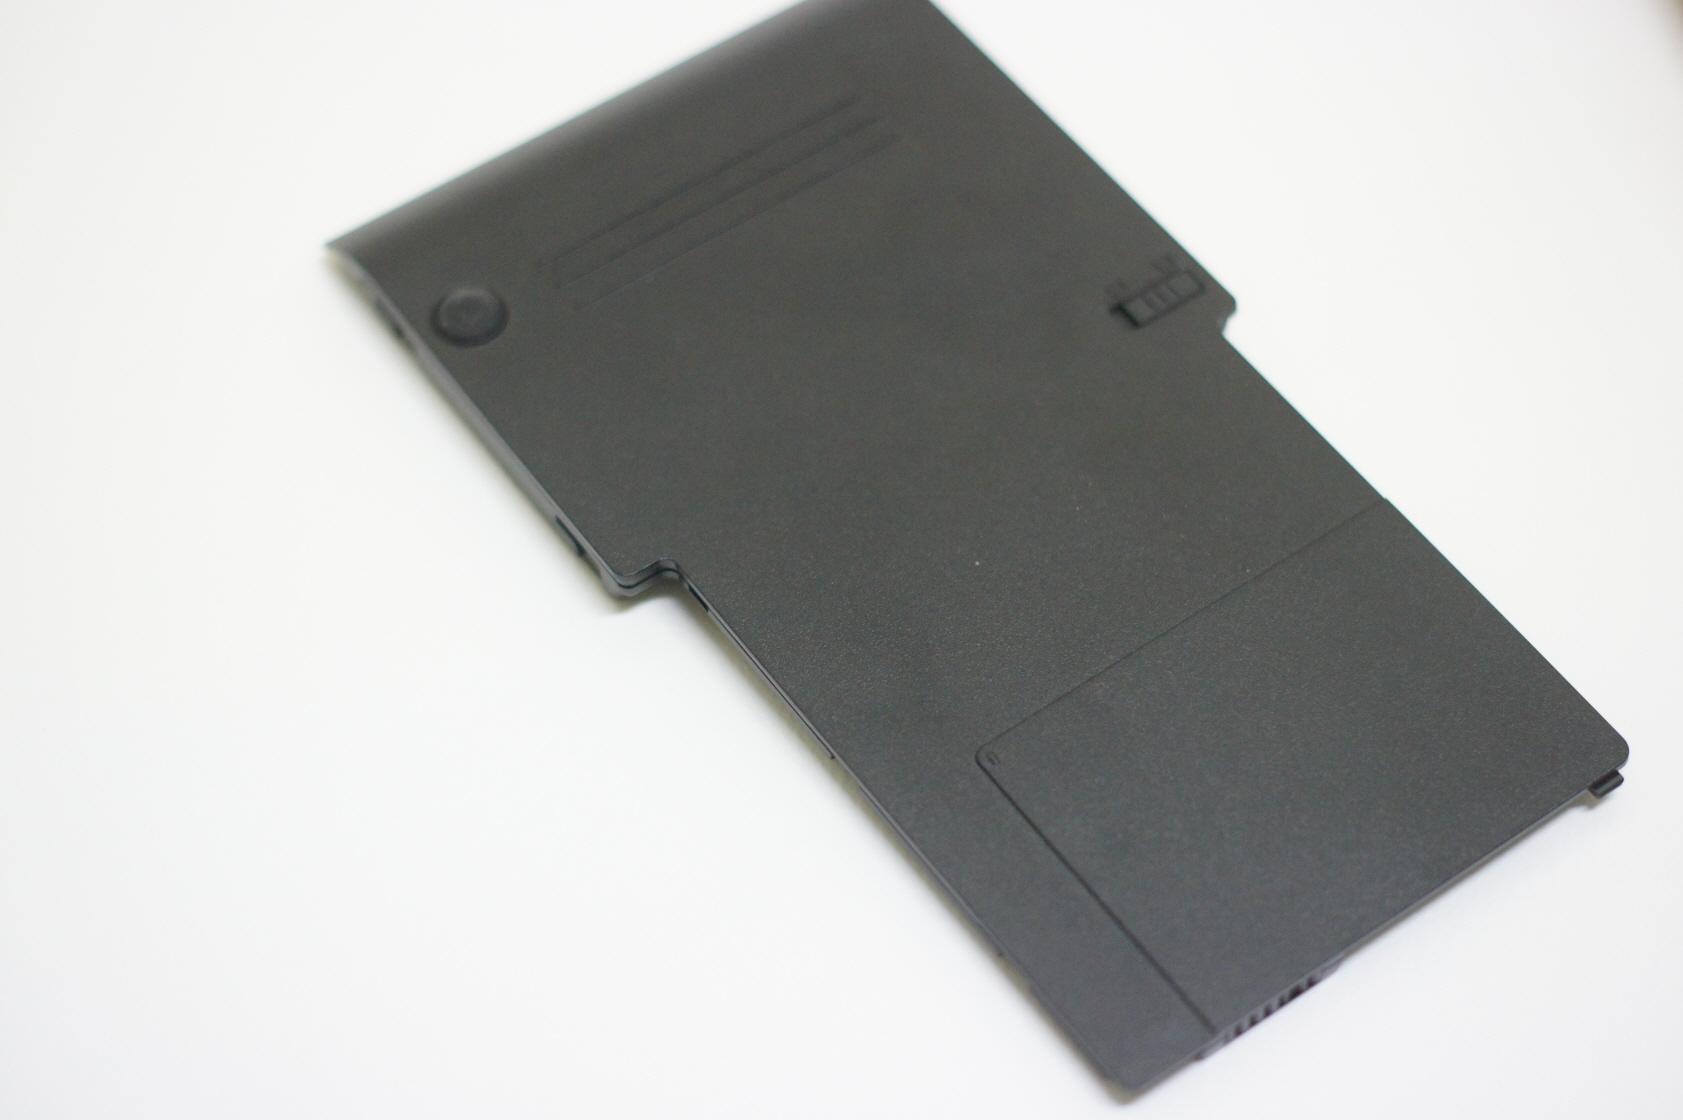 DSC09563.JPG